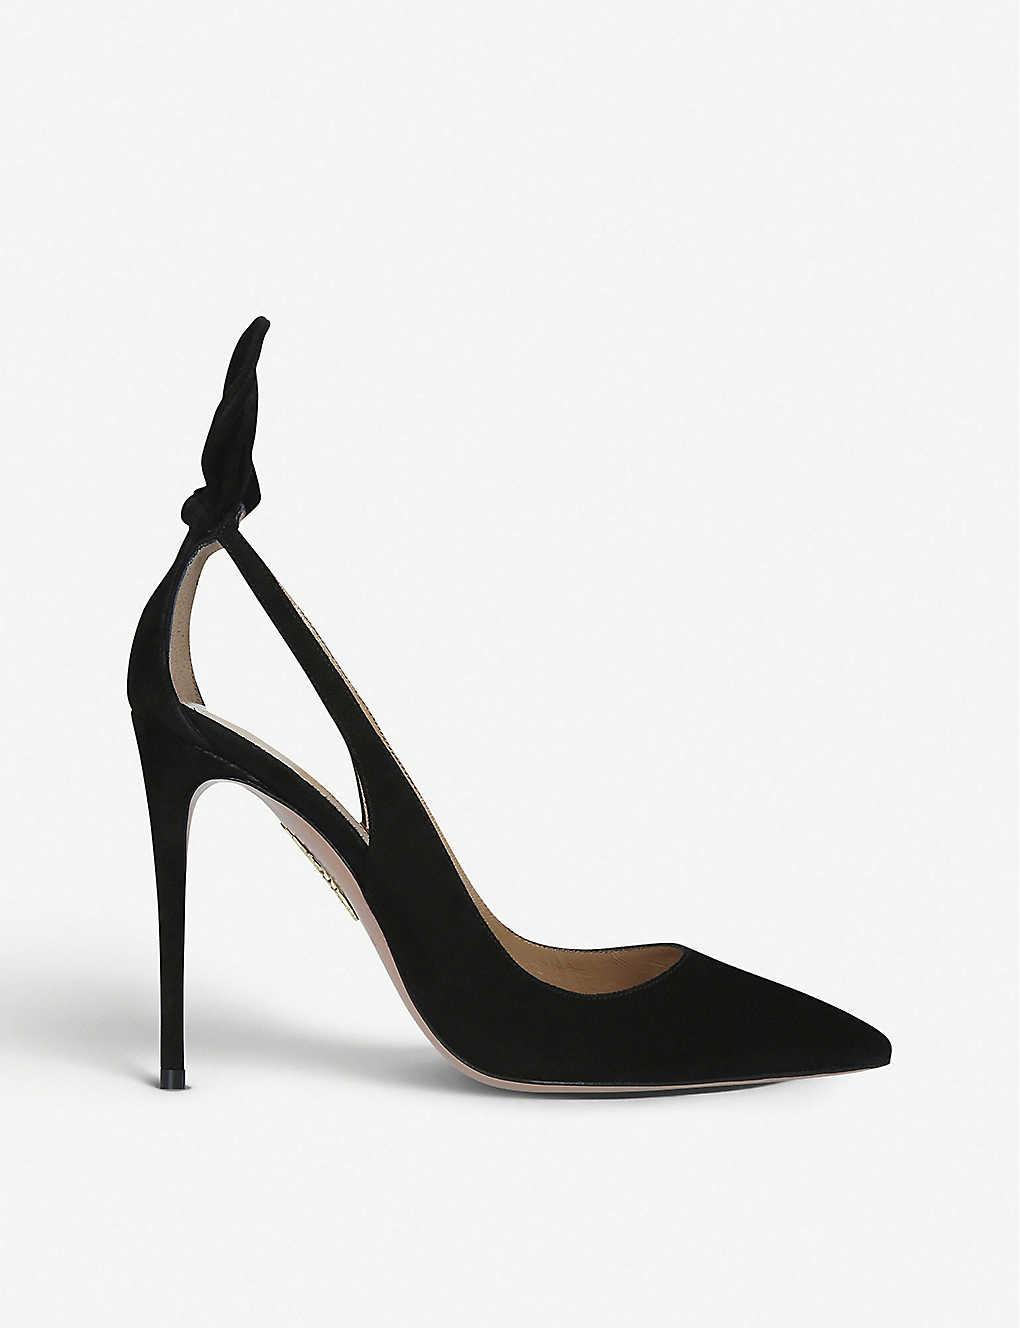 Aquazzura Shoes Deneuve suede heeled pumps